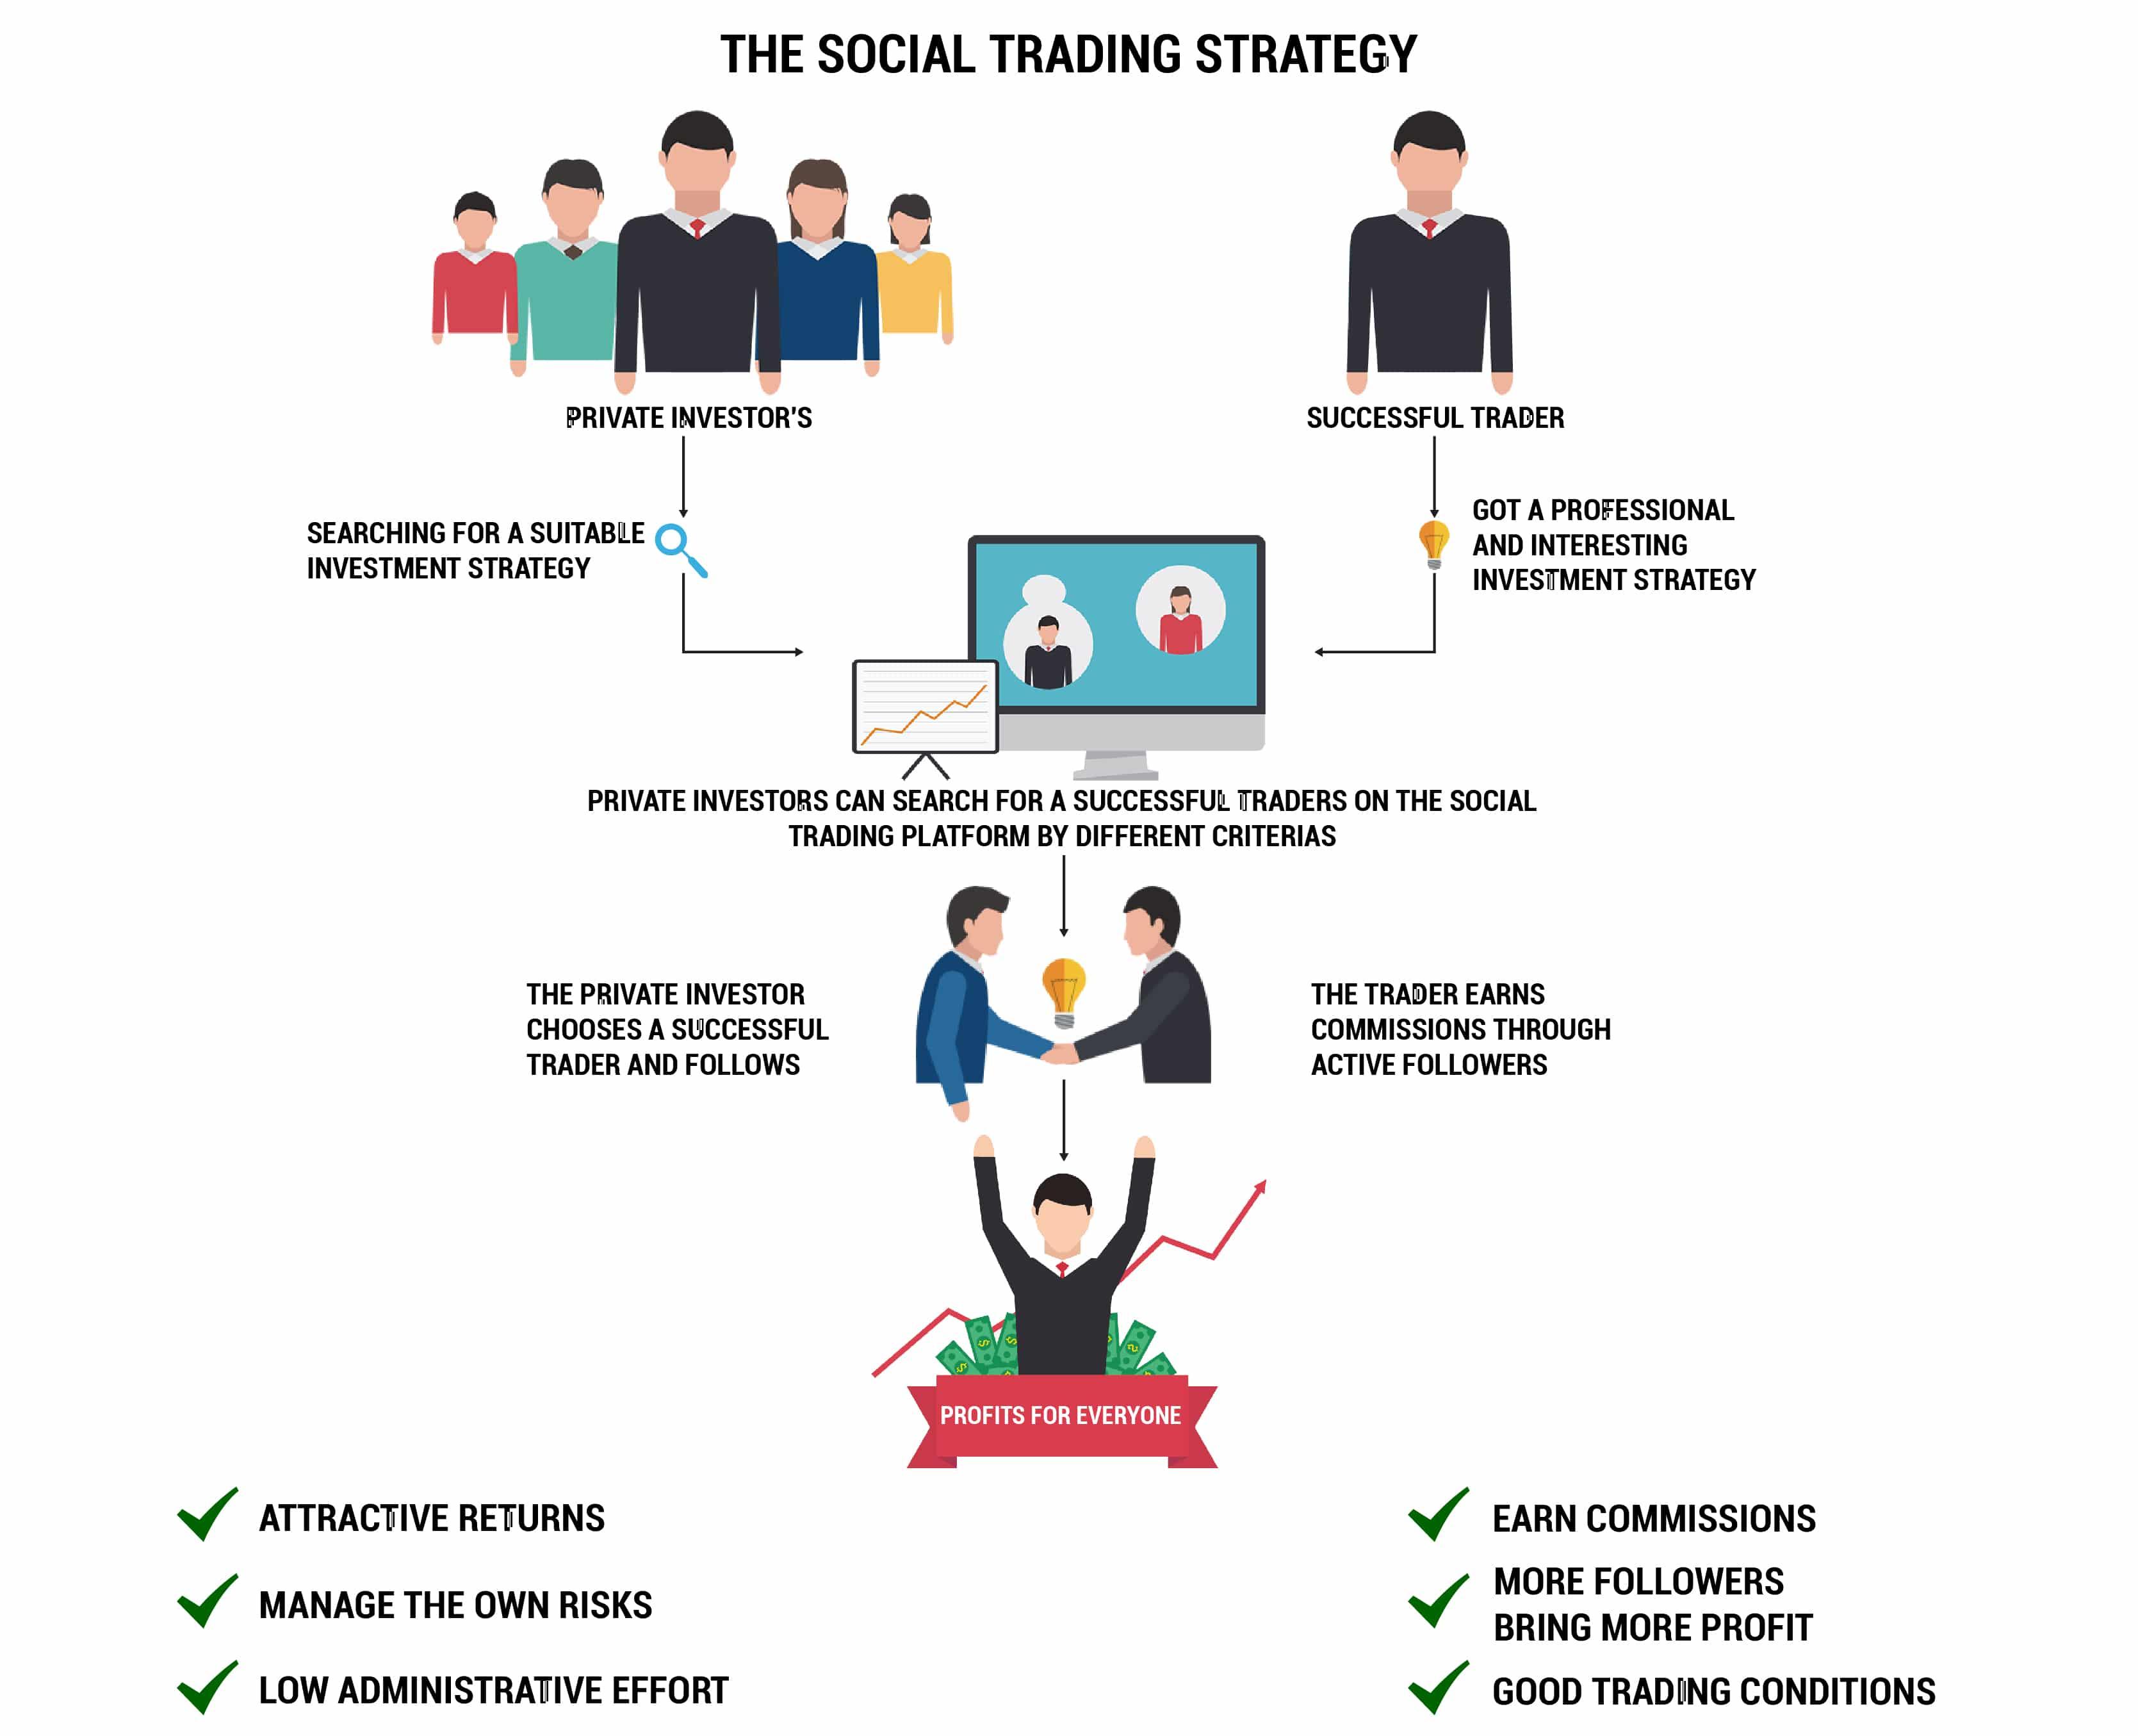 tranzacționare de succes a comercianților